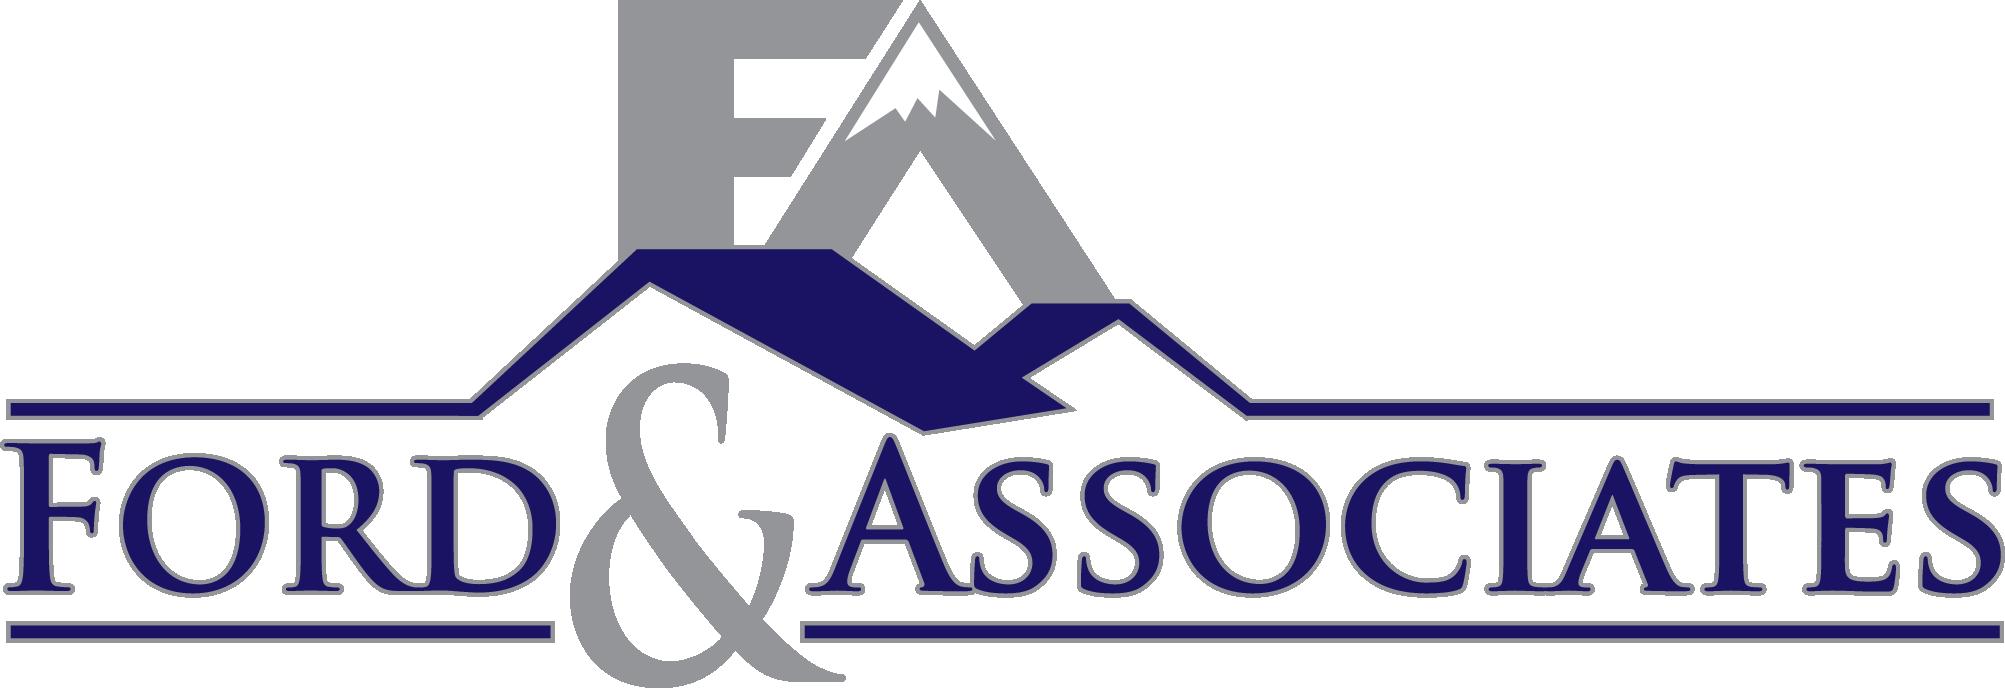 Ford & Associates logo